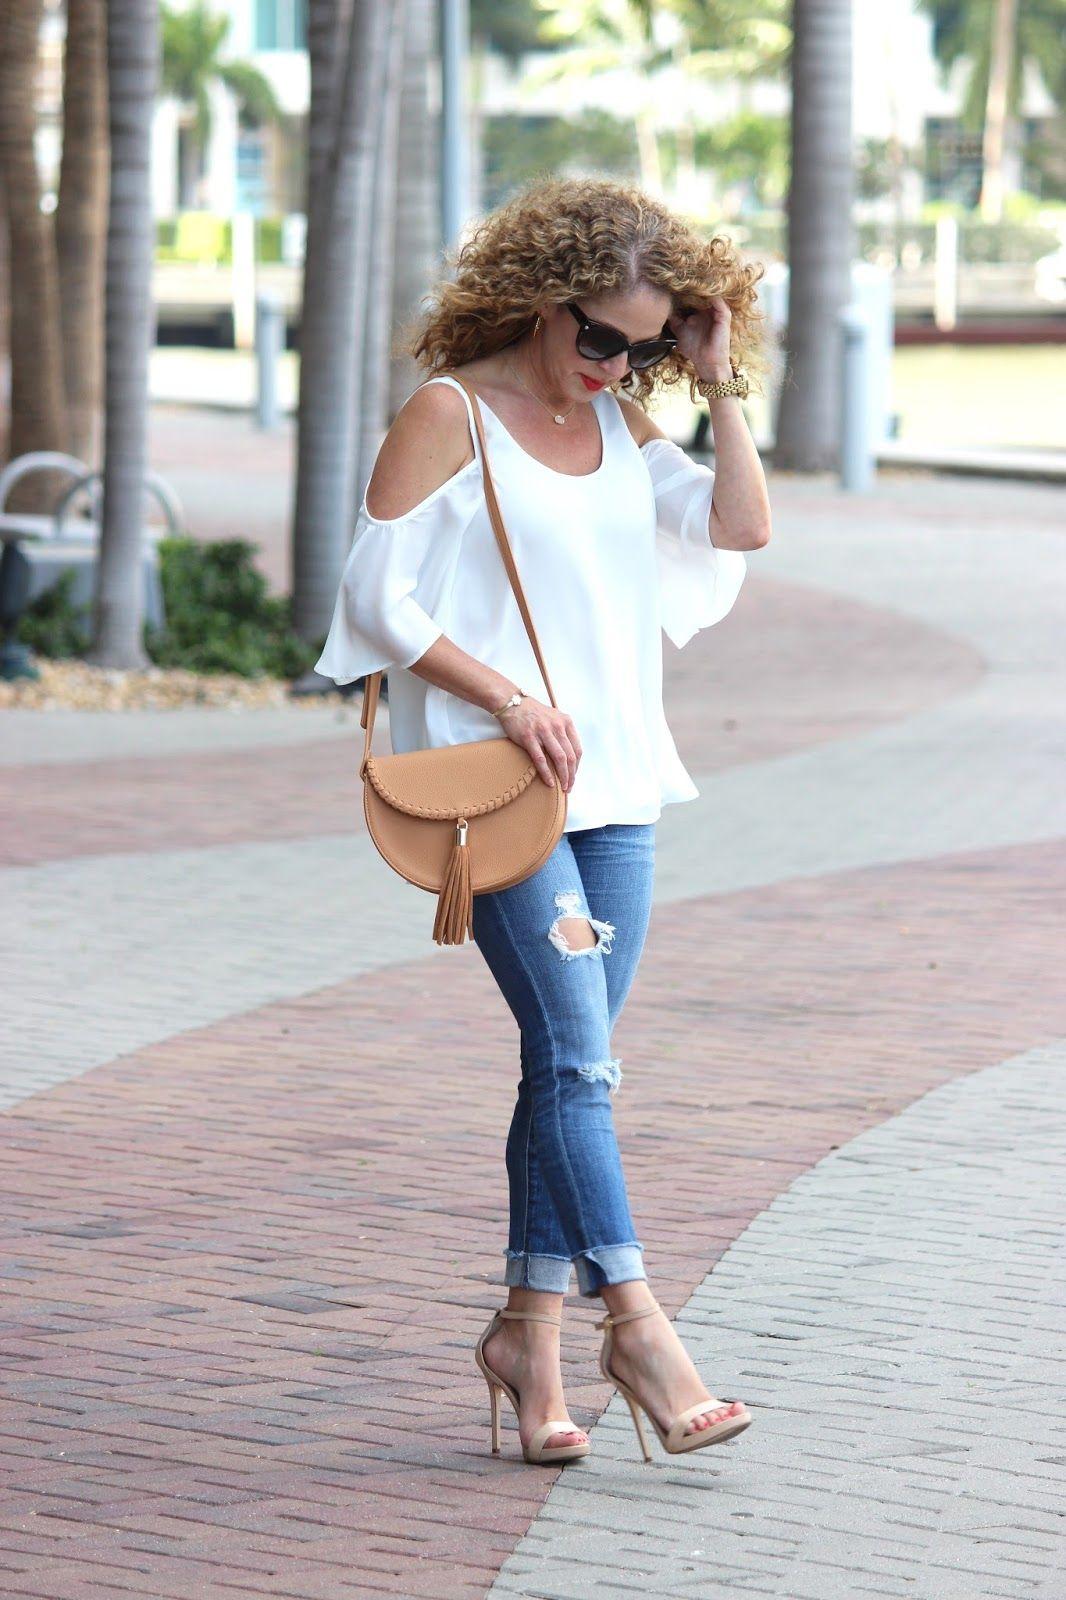 e957bd173c White cutout Shoulder Top + Distressed Skinny Jeans + Tan Fringe Crossboday  Bag | Girl in a Hot City: Tasseled